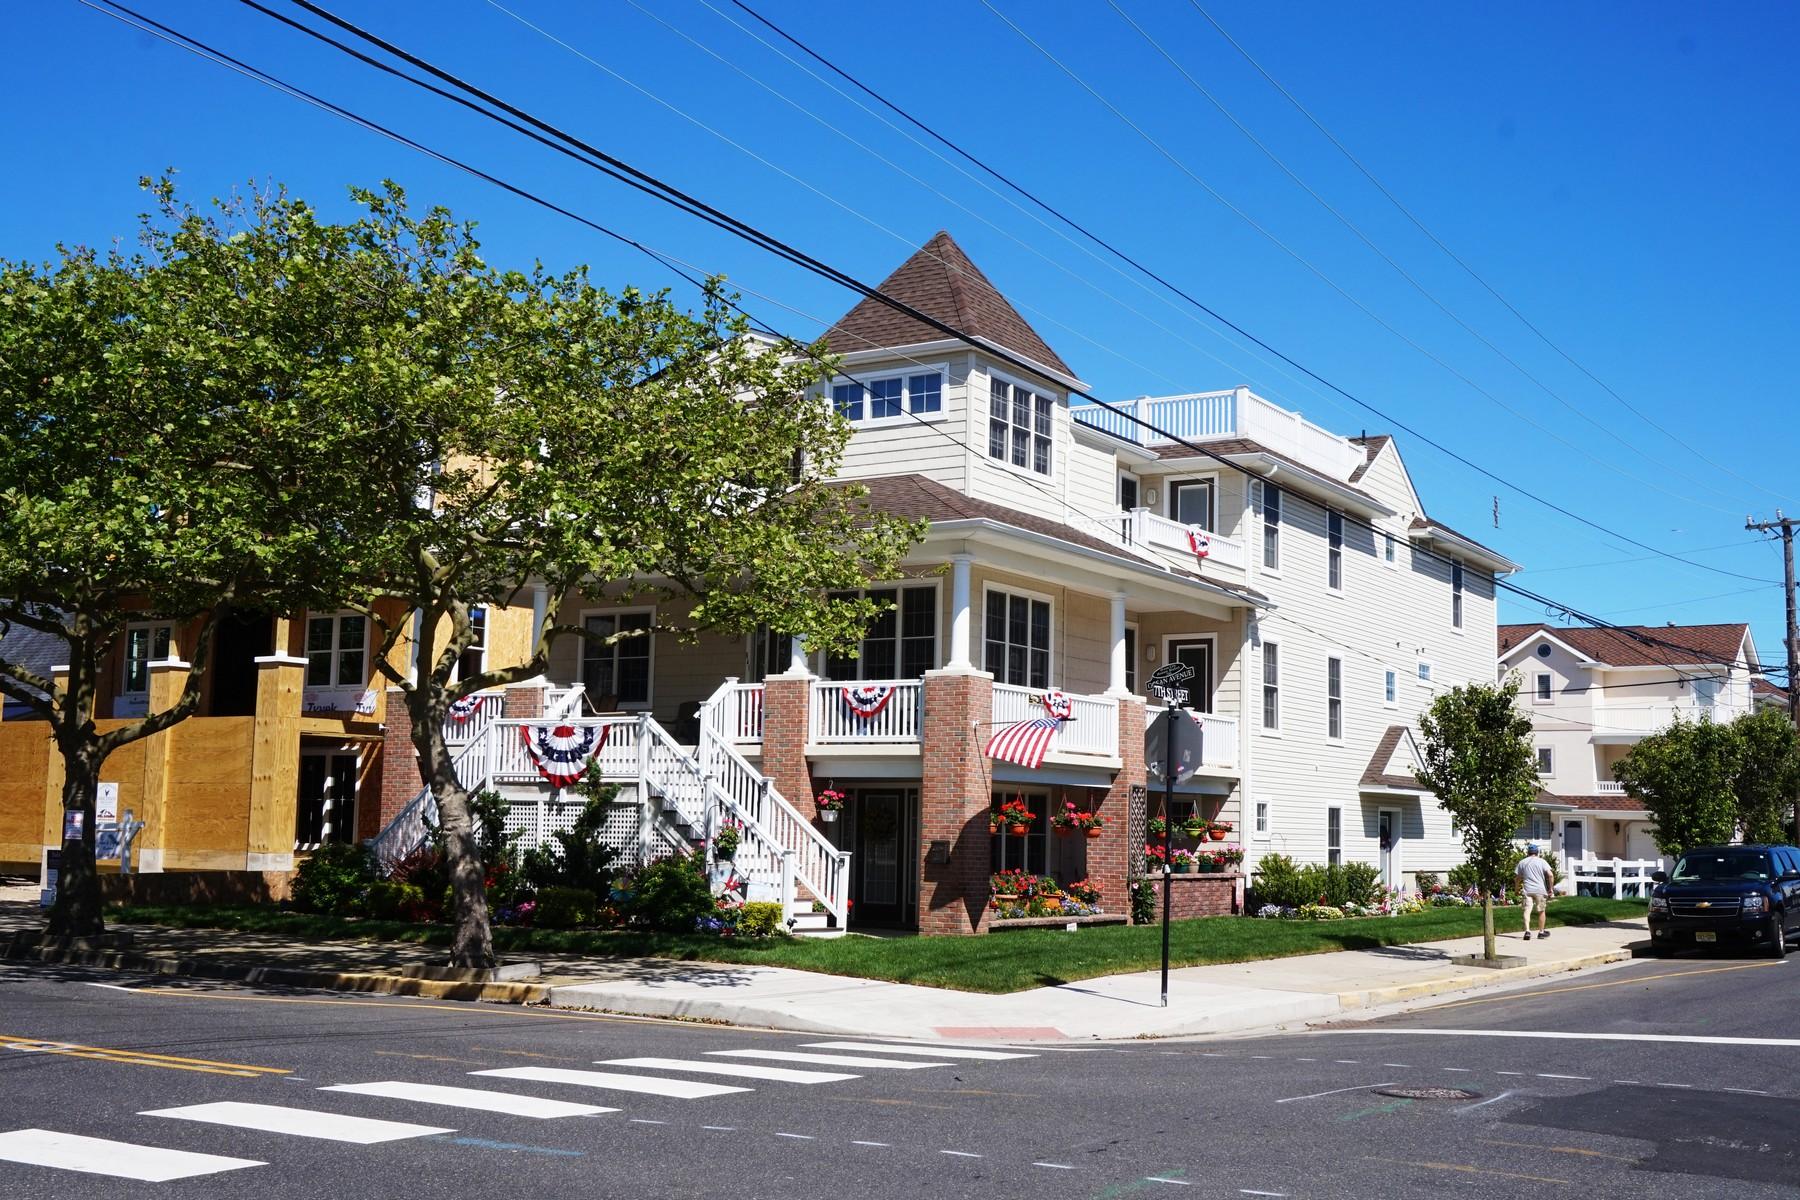 Condominium for Sale at First Floor Corner Condo 641 Ocean Avenue First Floor Ocean City, New Jersey, 08226 United States